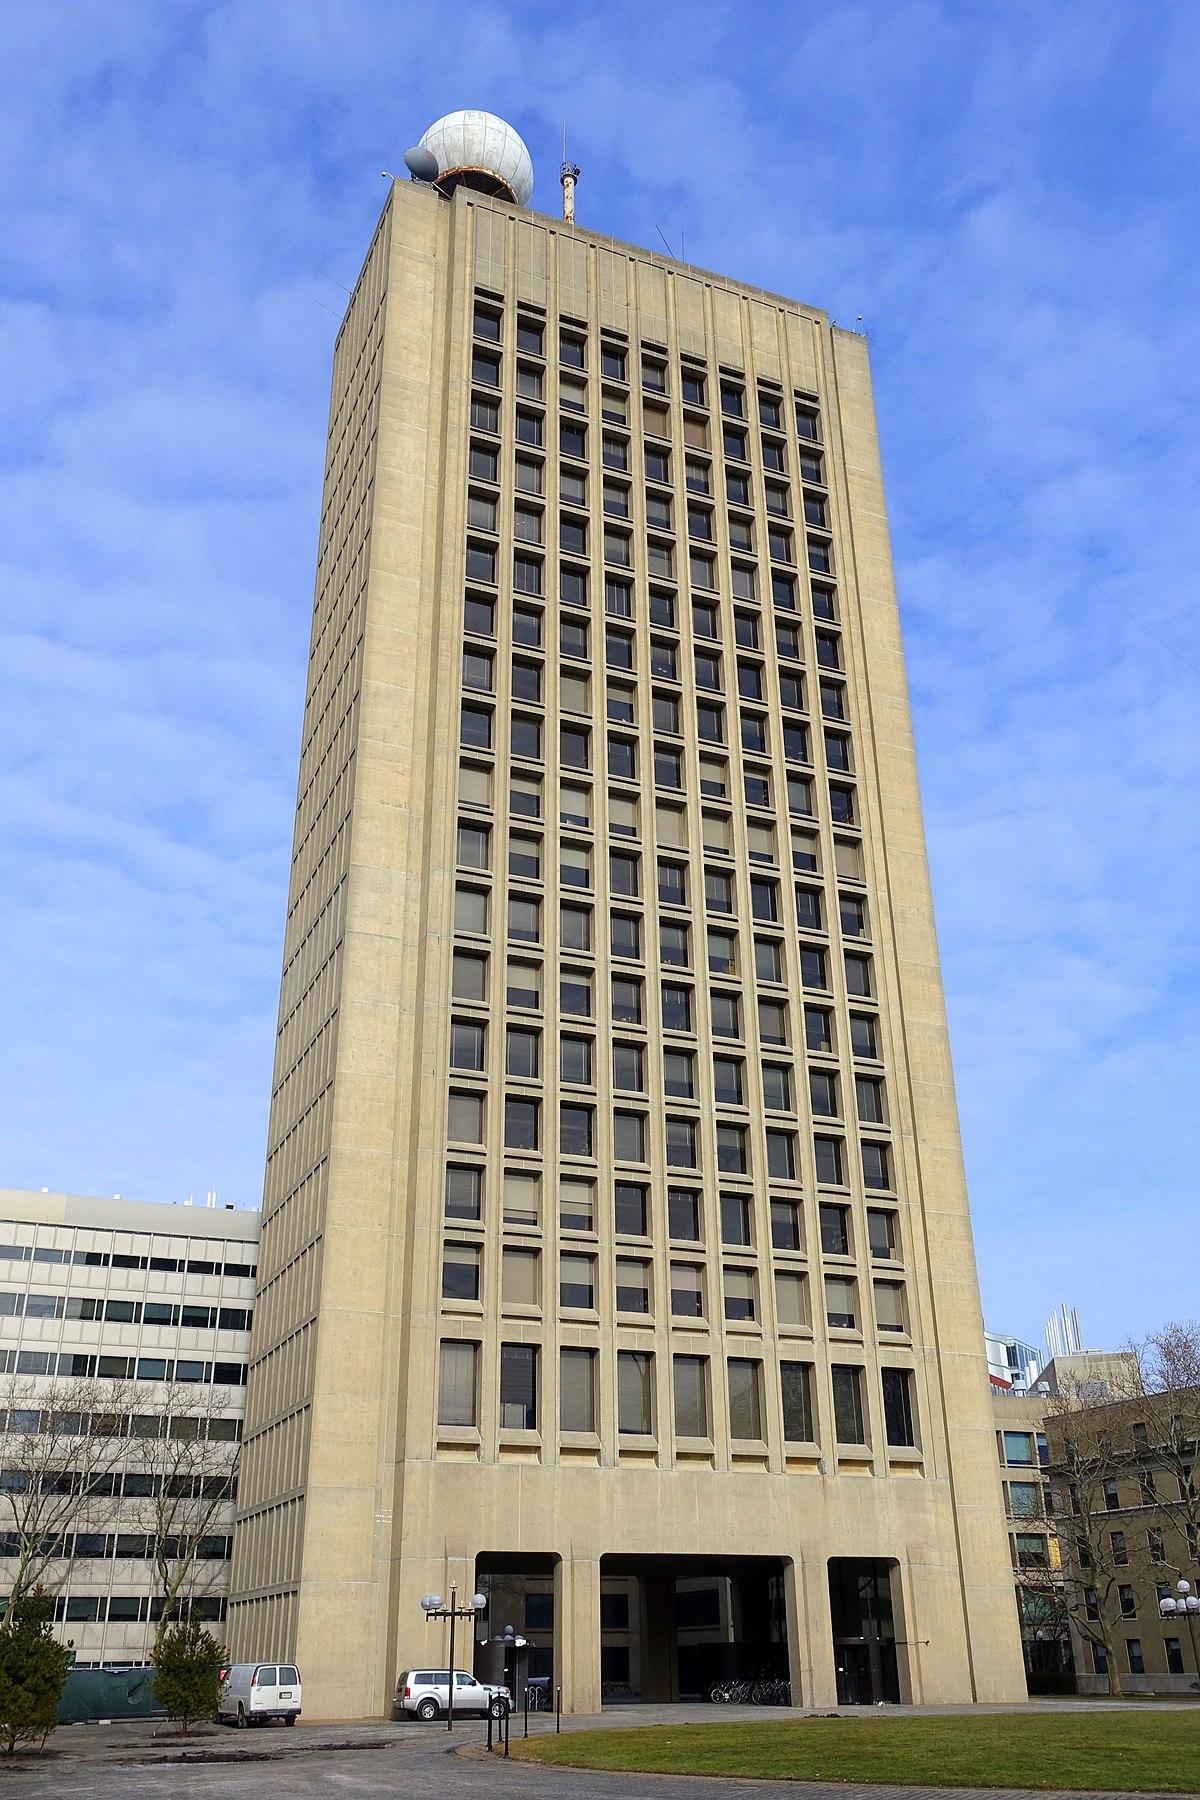 Green Building (MIT) - Wikipedia